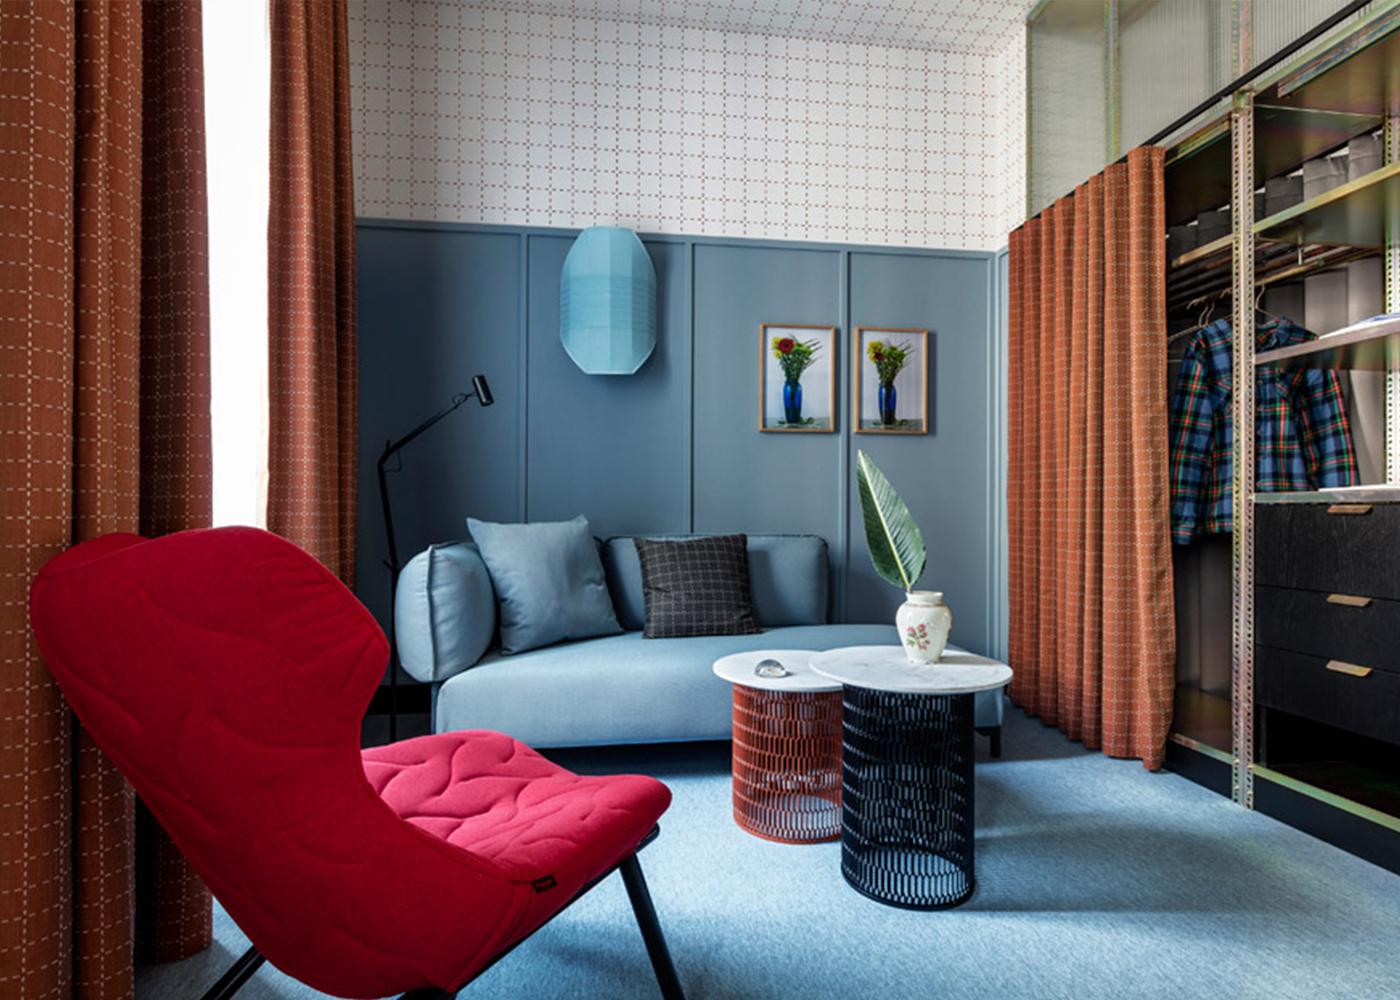 patricia-urquiola-room-mate-hotels-interior-design-milan_dezeen_936_6